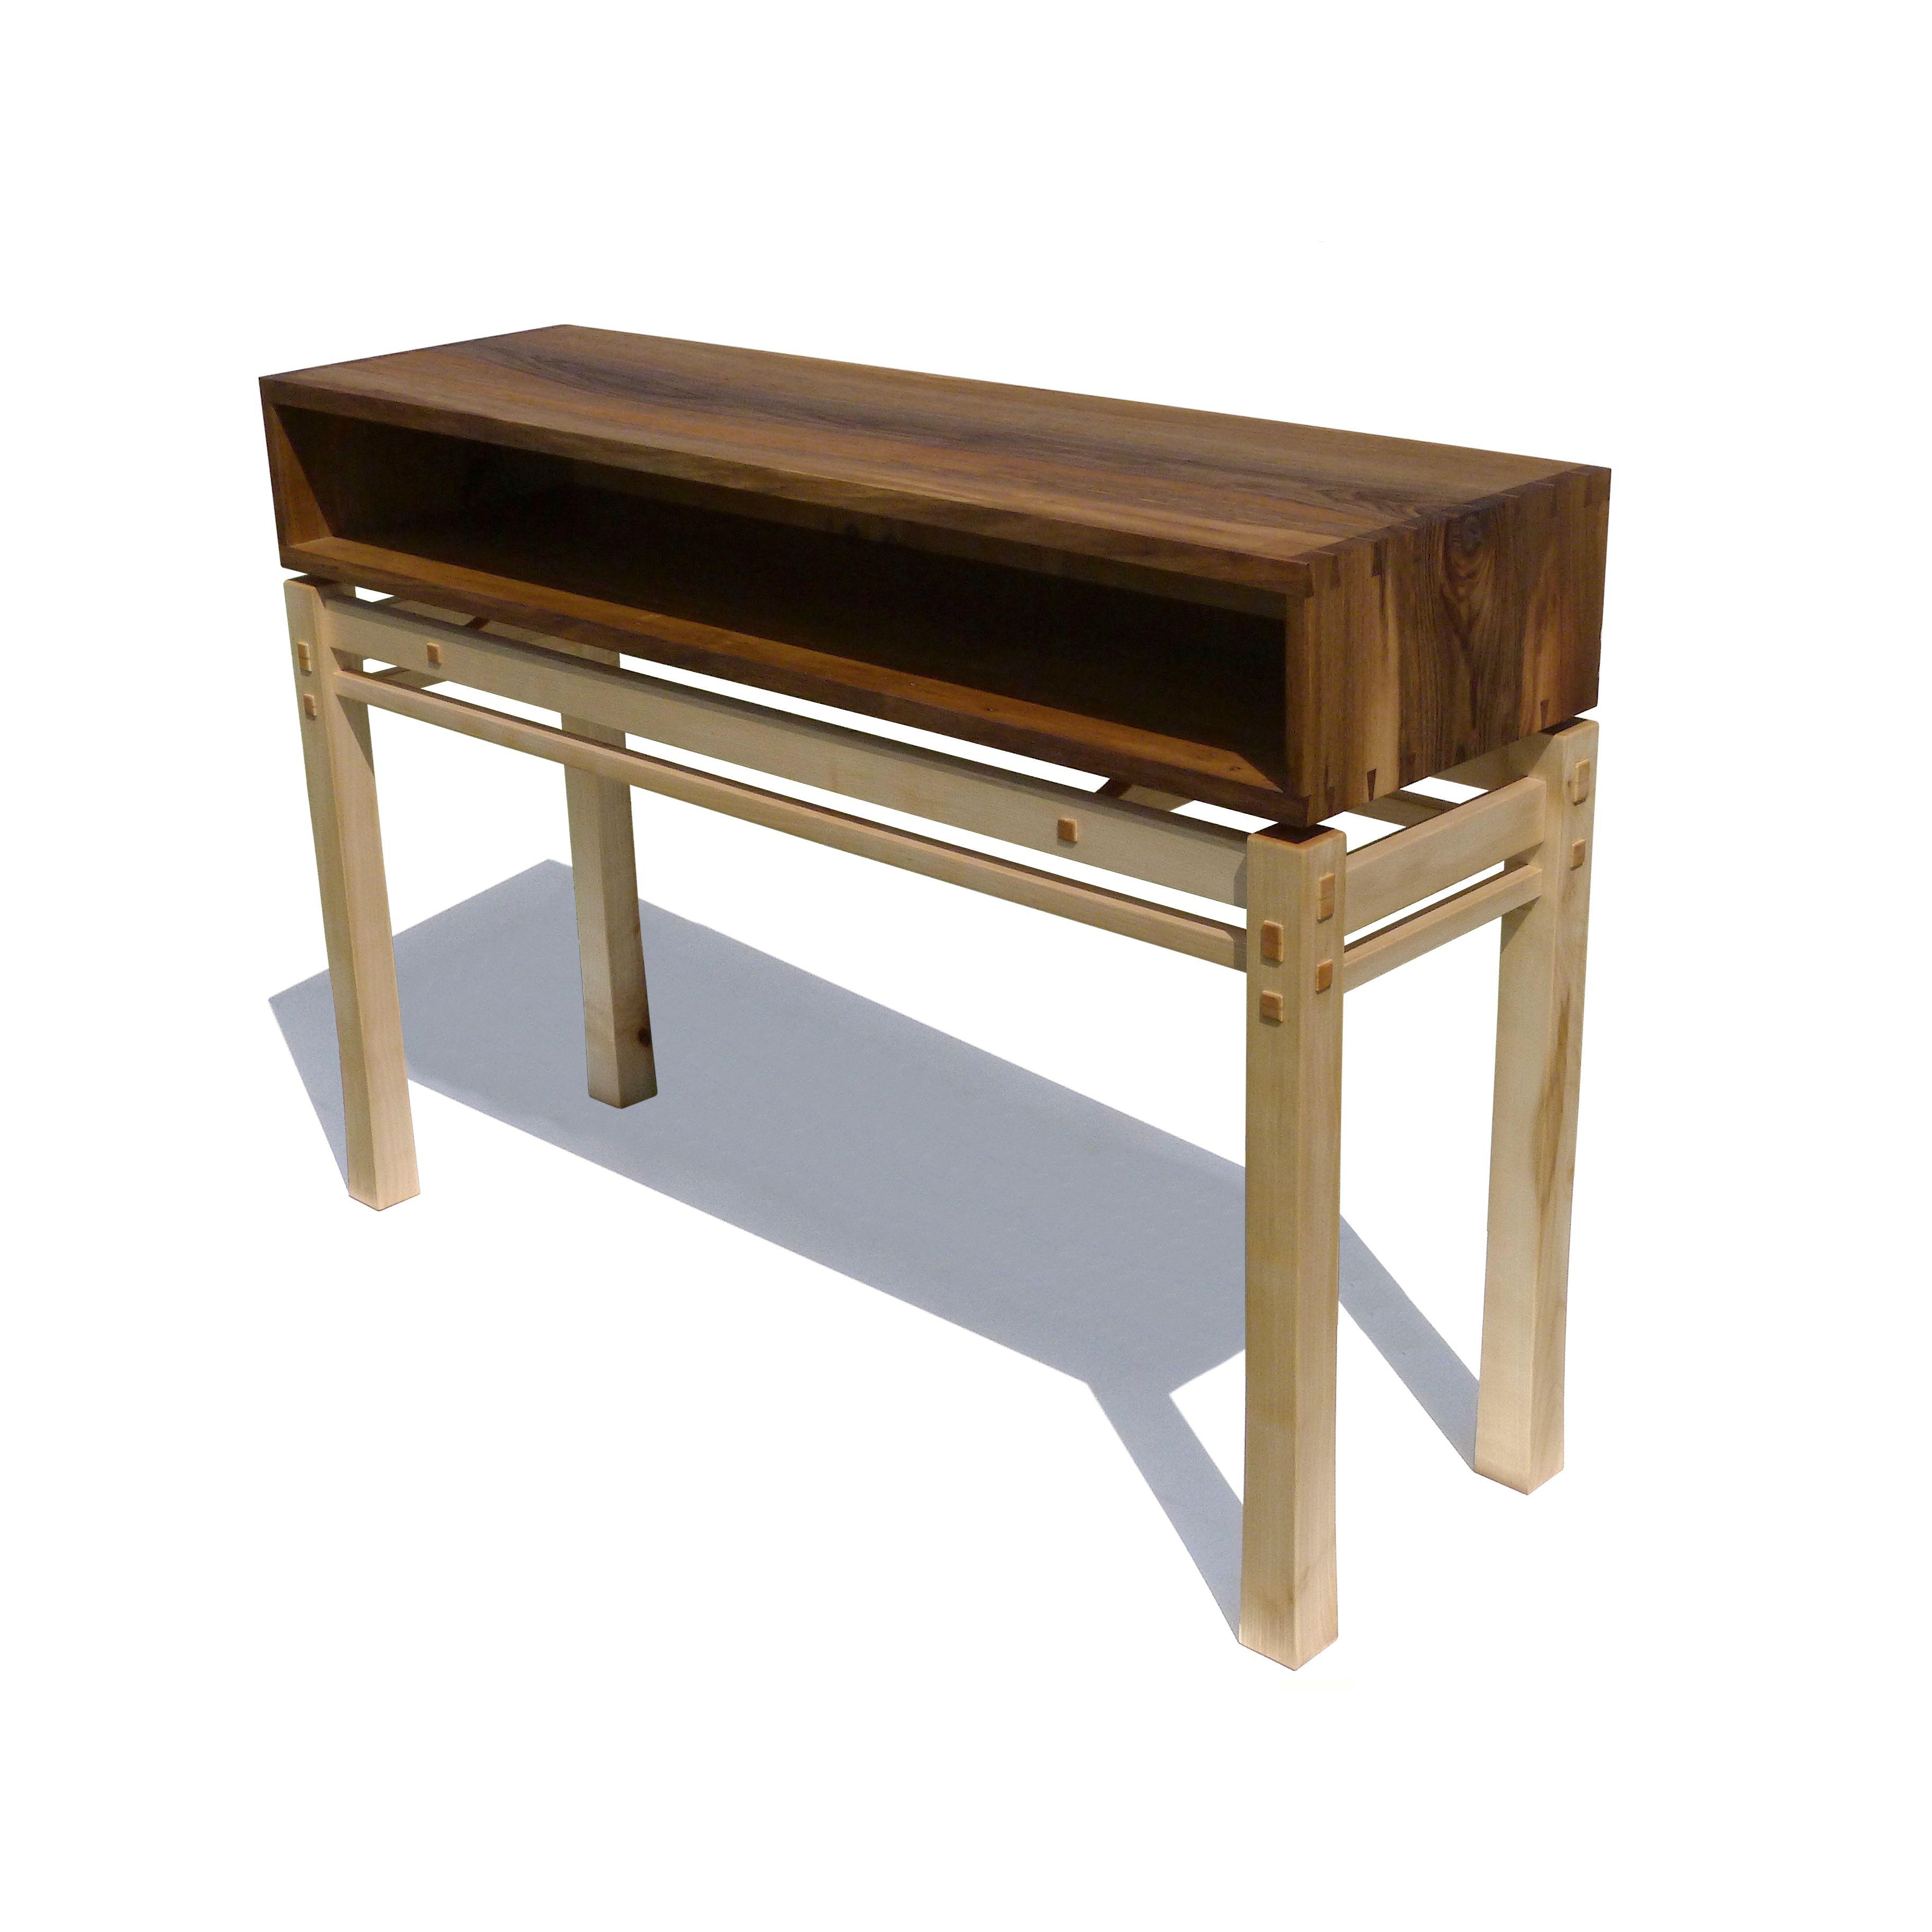 911cf10a7225c9ff3f1d463aa29e4db3 Impressionnant De Table ascenseur Des Idées